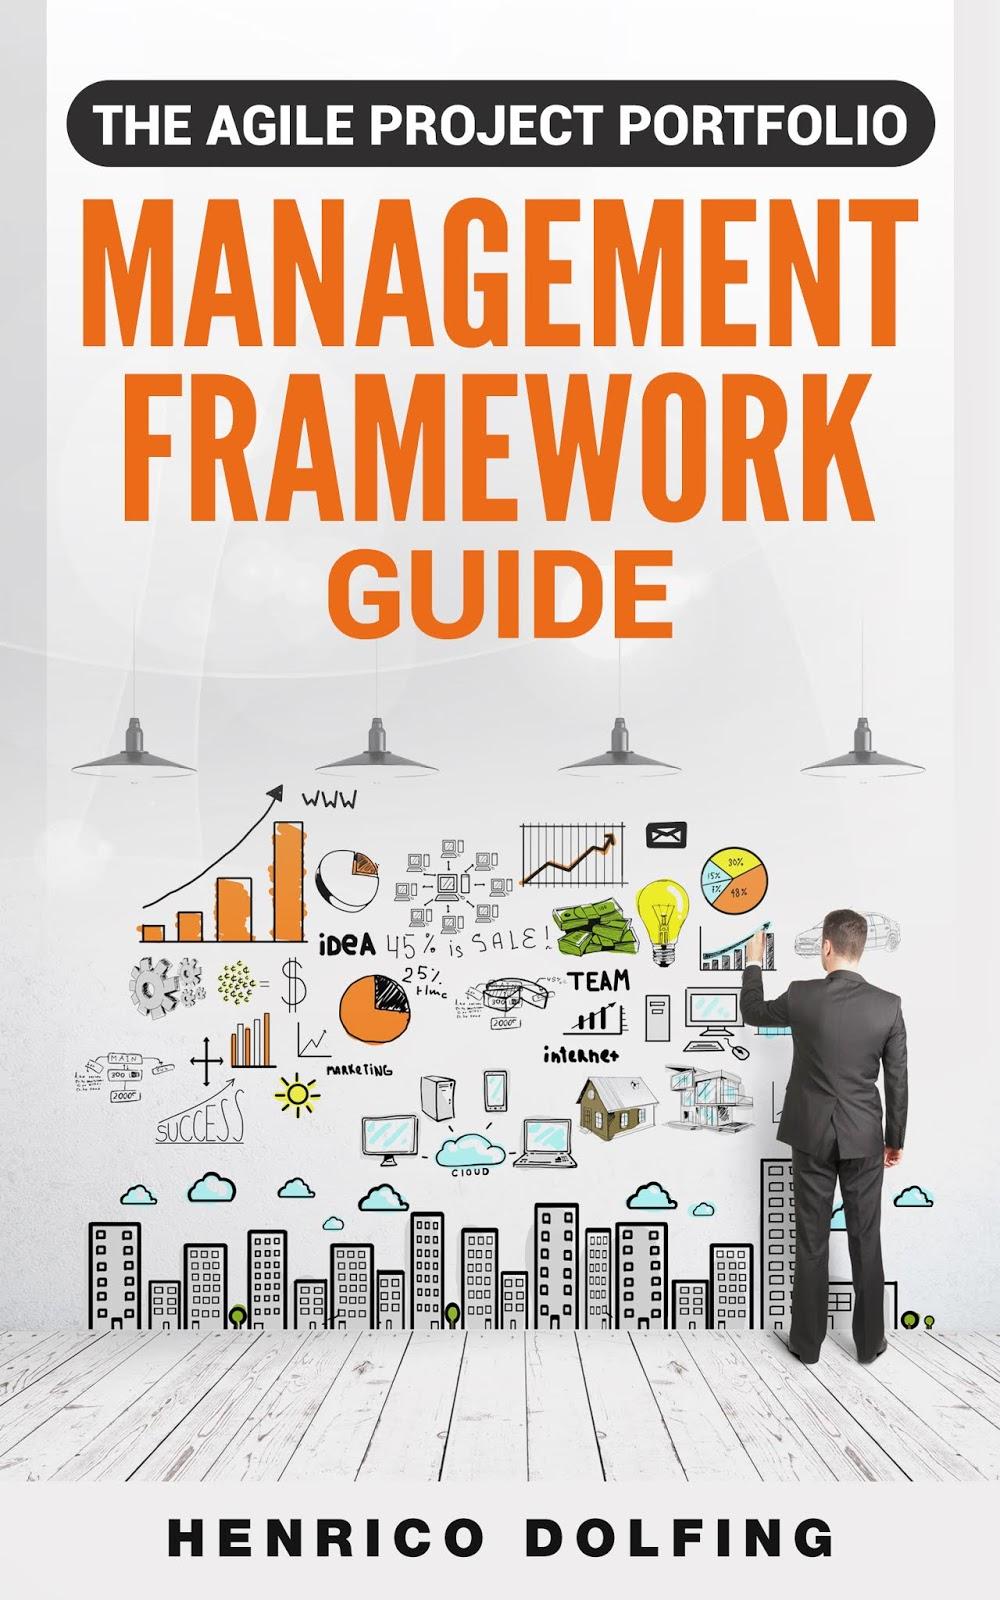 agile project portfolio management framework guide [ 1000 x 1600 Pixel ]